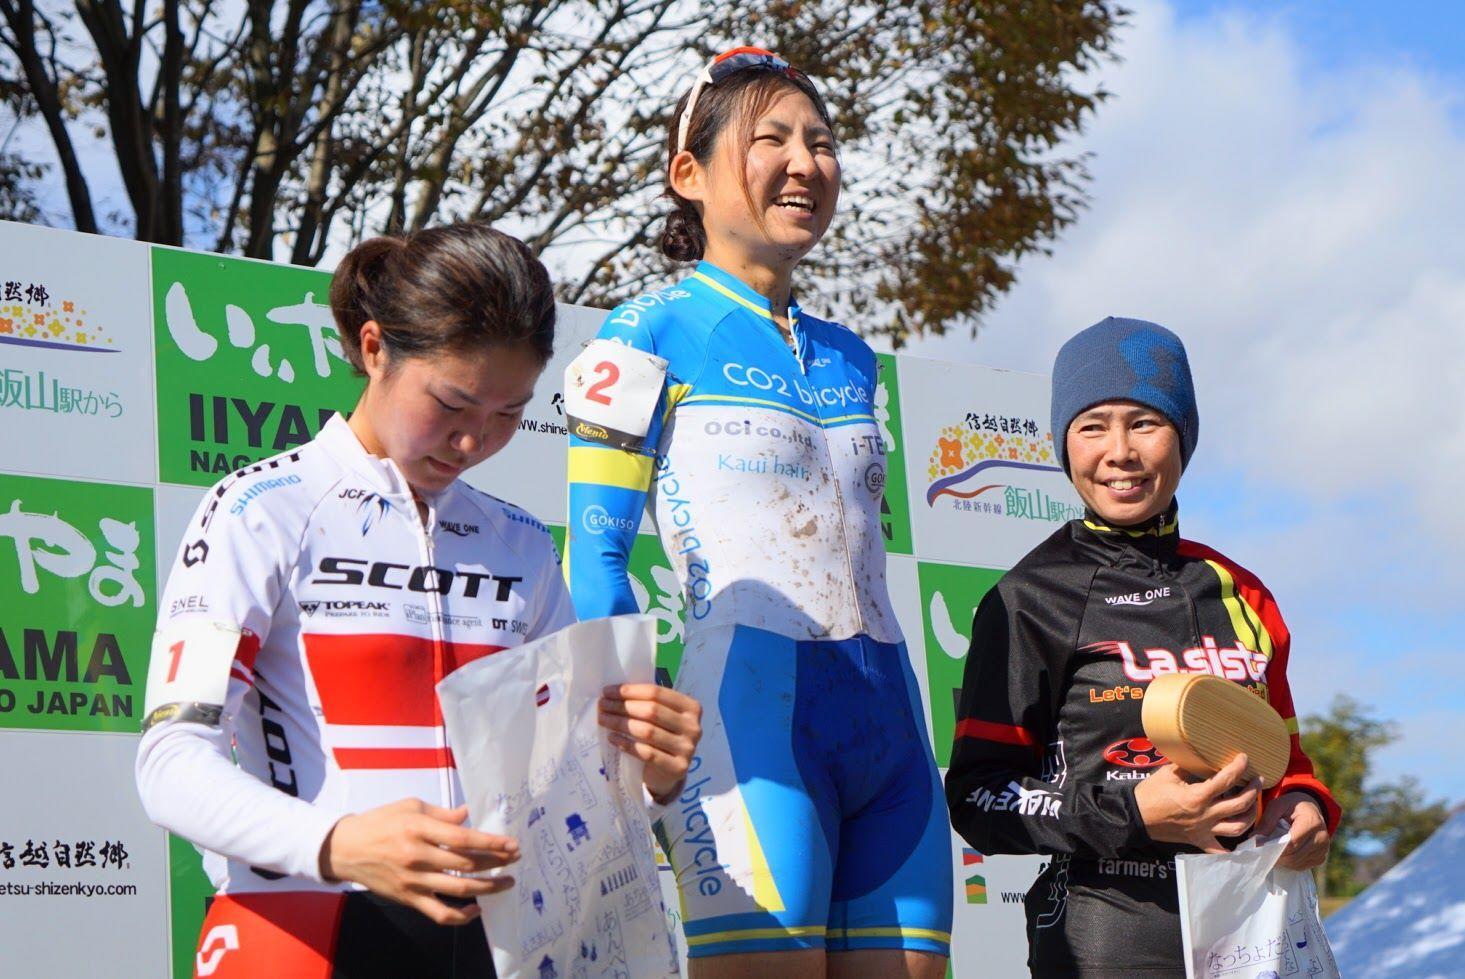 https://www.cyclocross.jp/news/75540014_1160823400973981_2655036065265483776_o.jpg